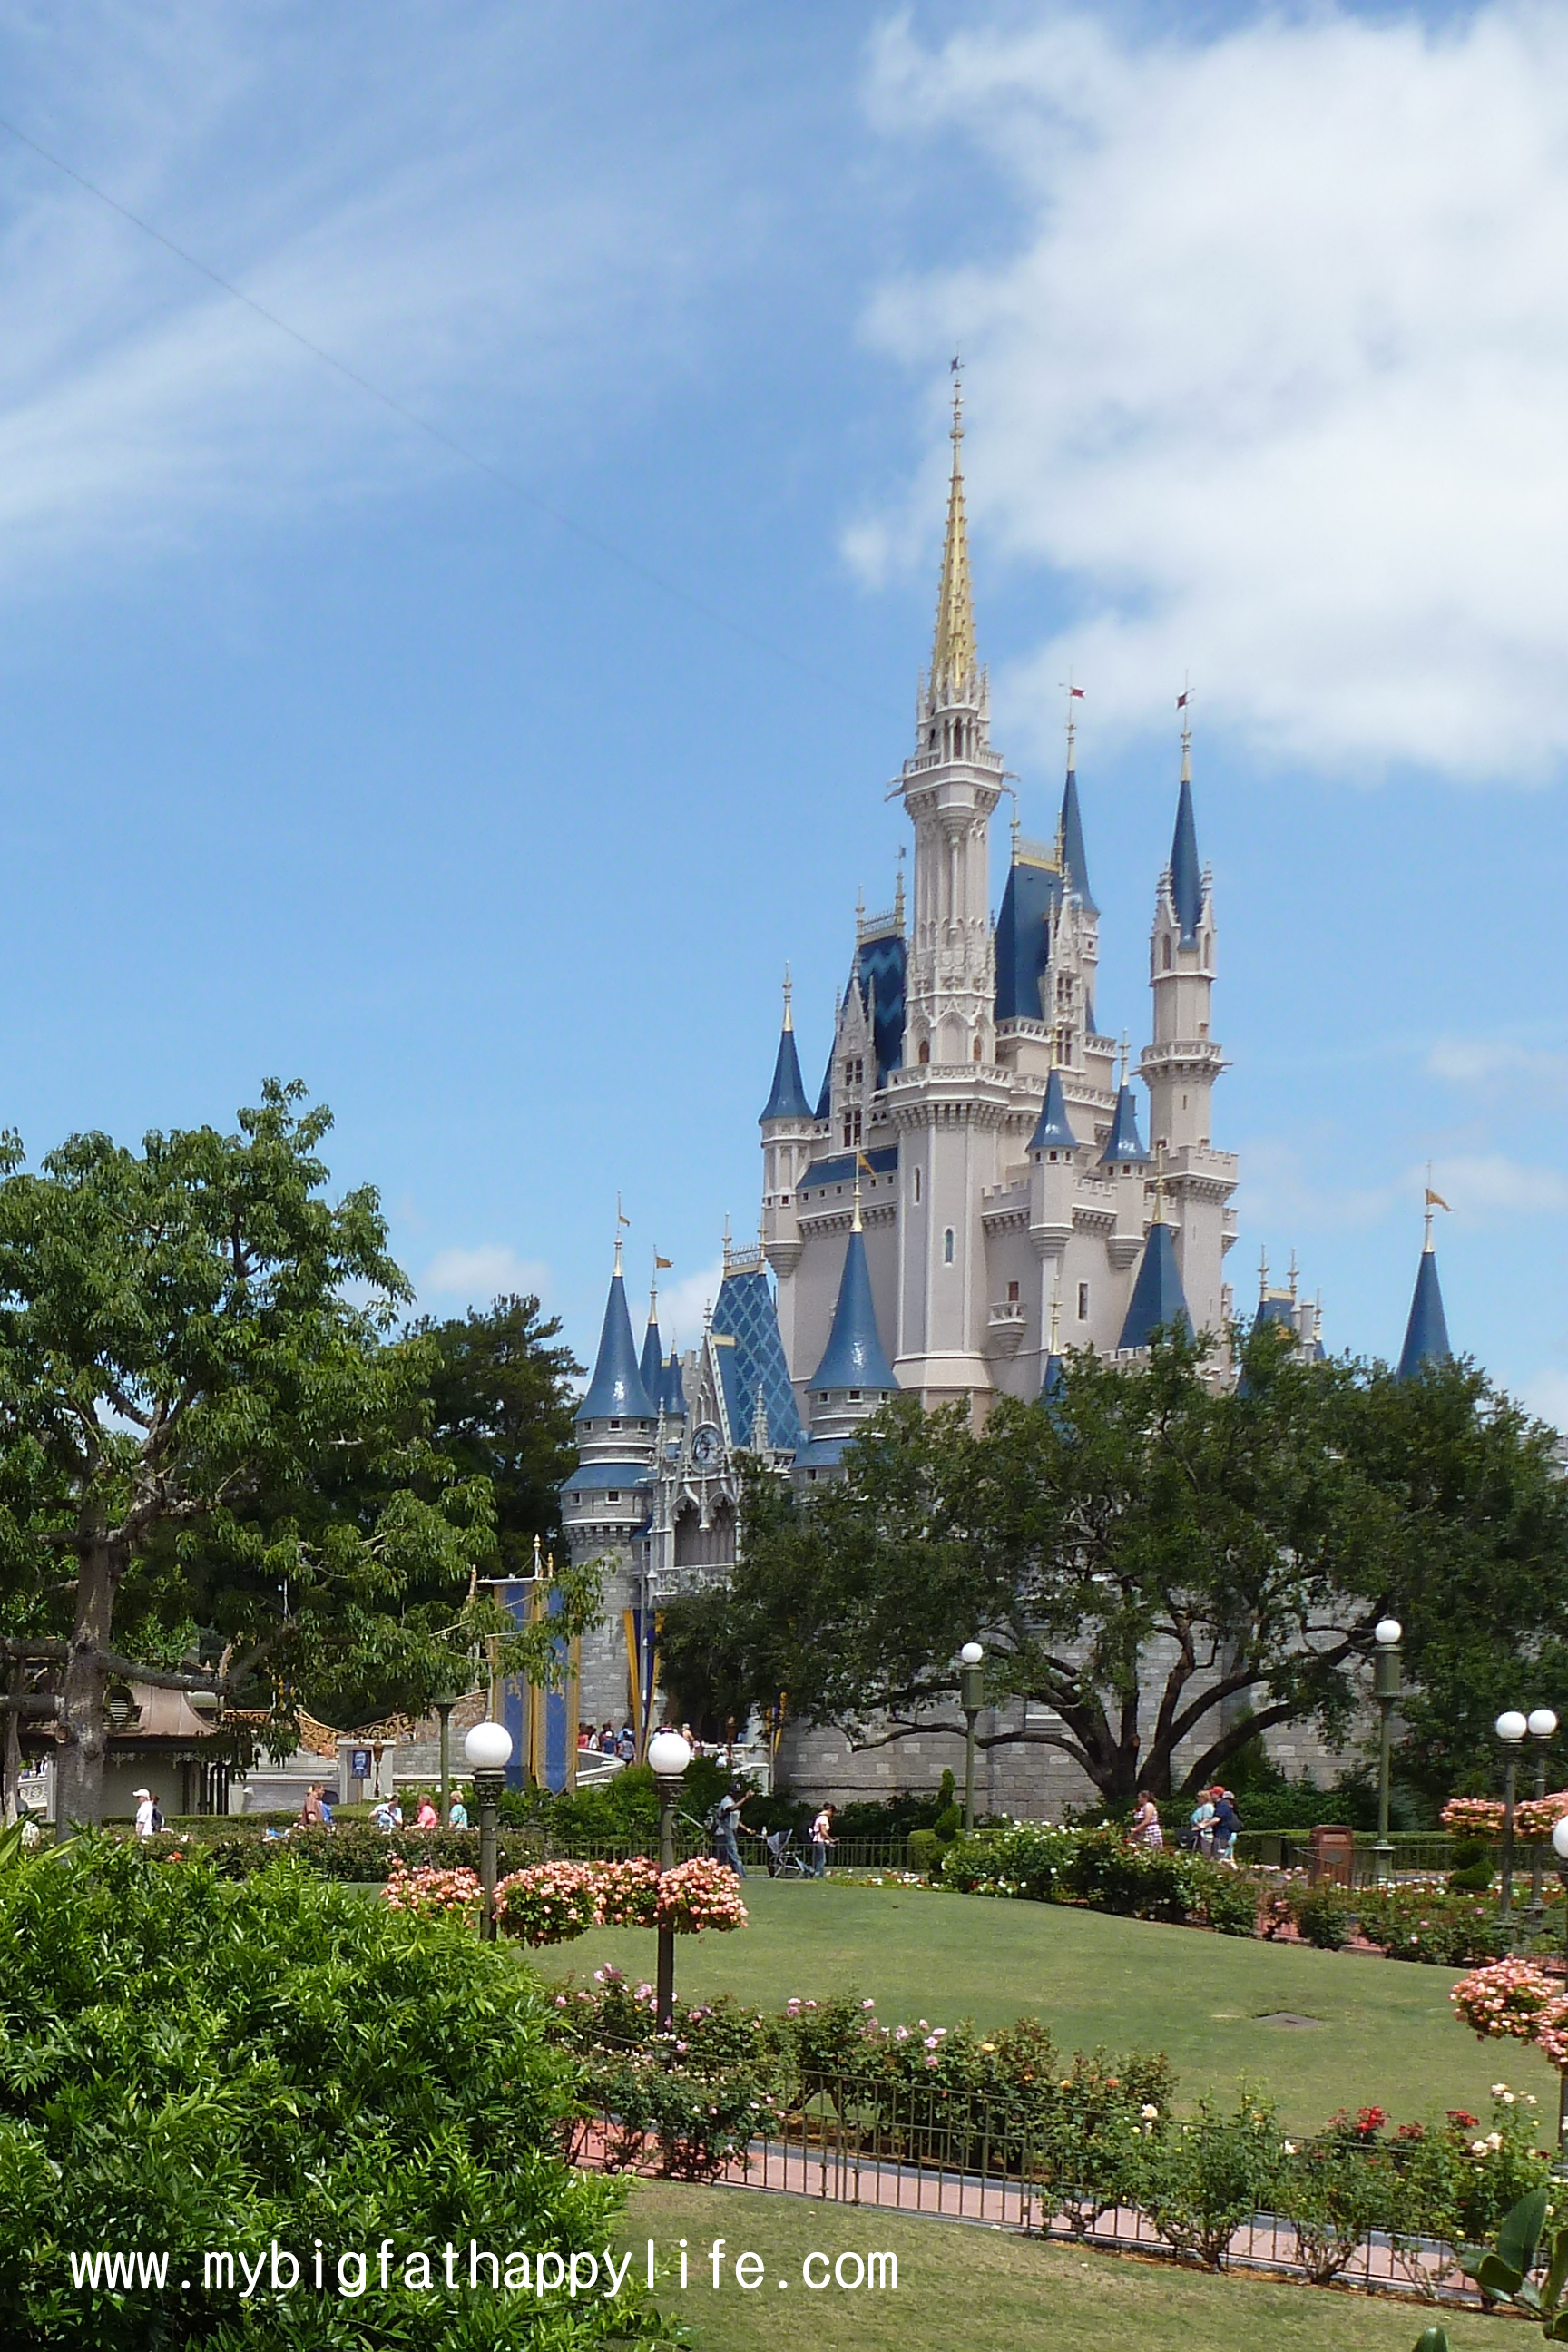 Cinderellas Castle Photo Ideas At Magic Kingdom Disney World